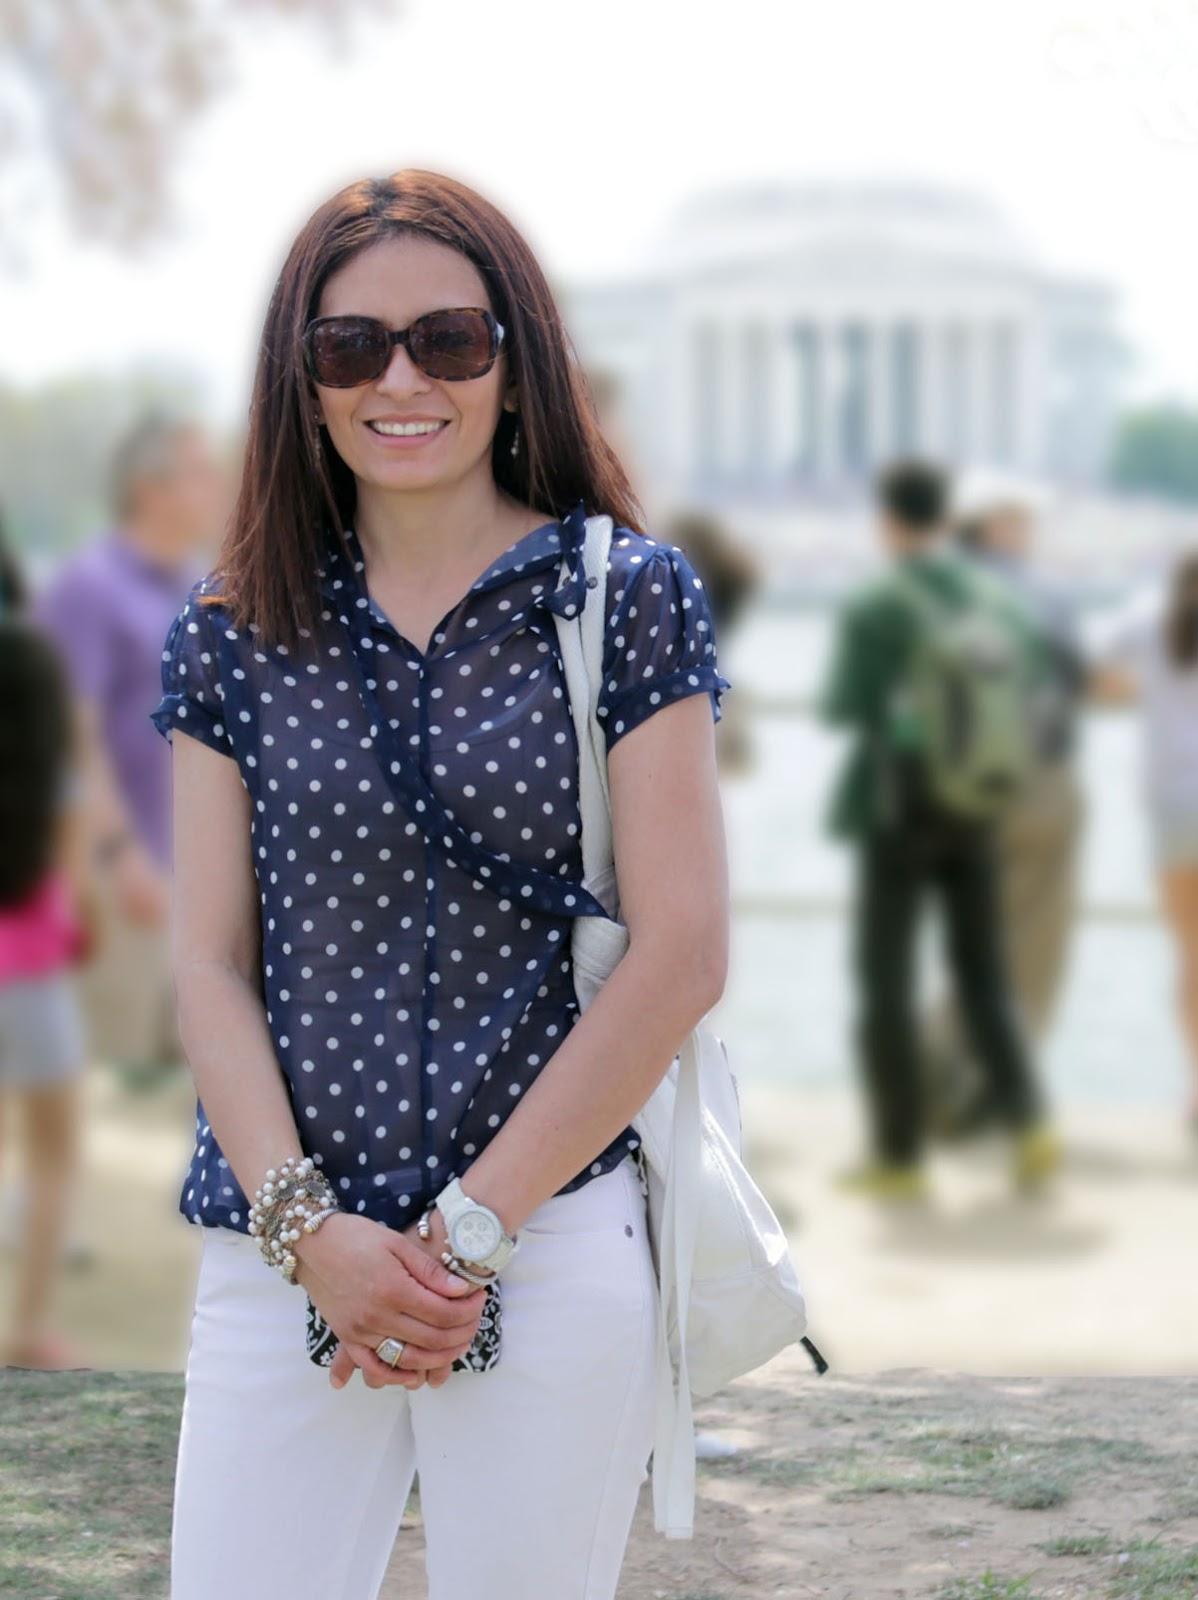 Cristina Garay at WW2 memorial Washington DC